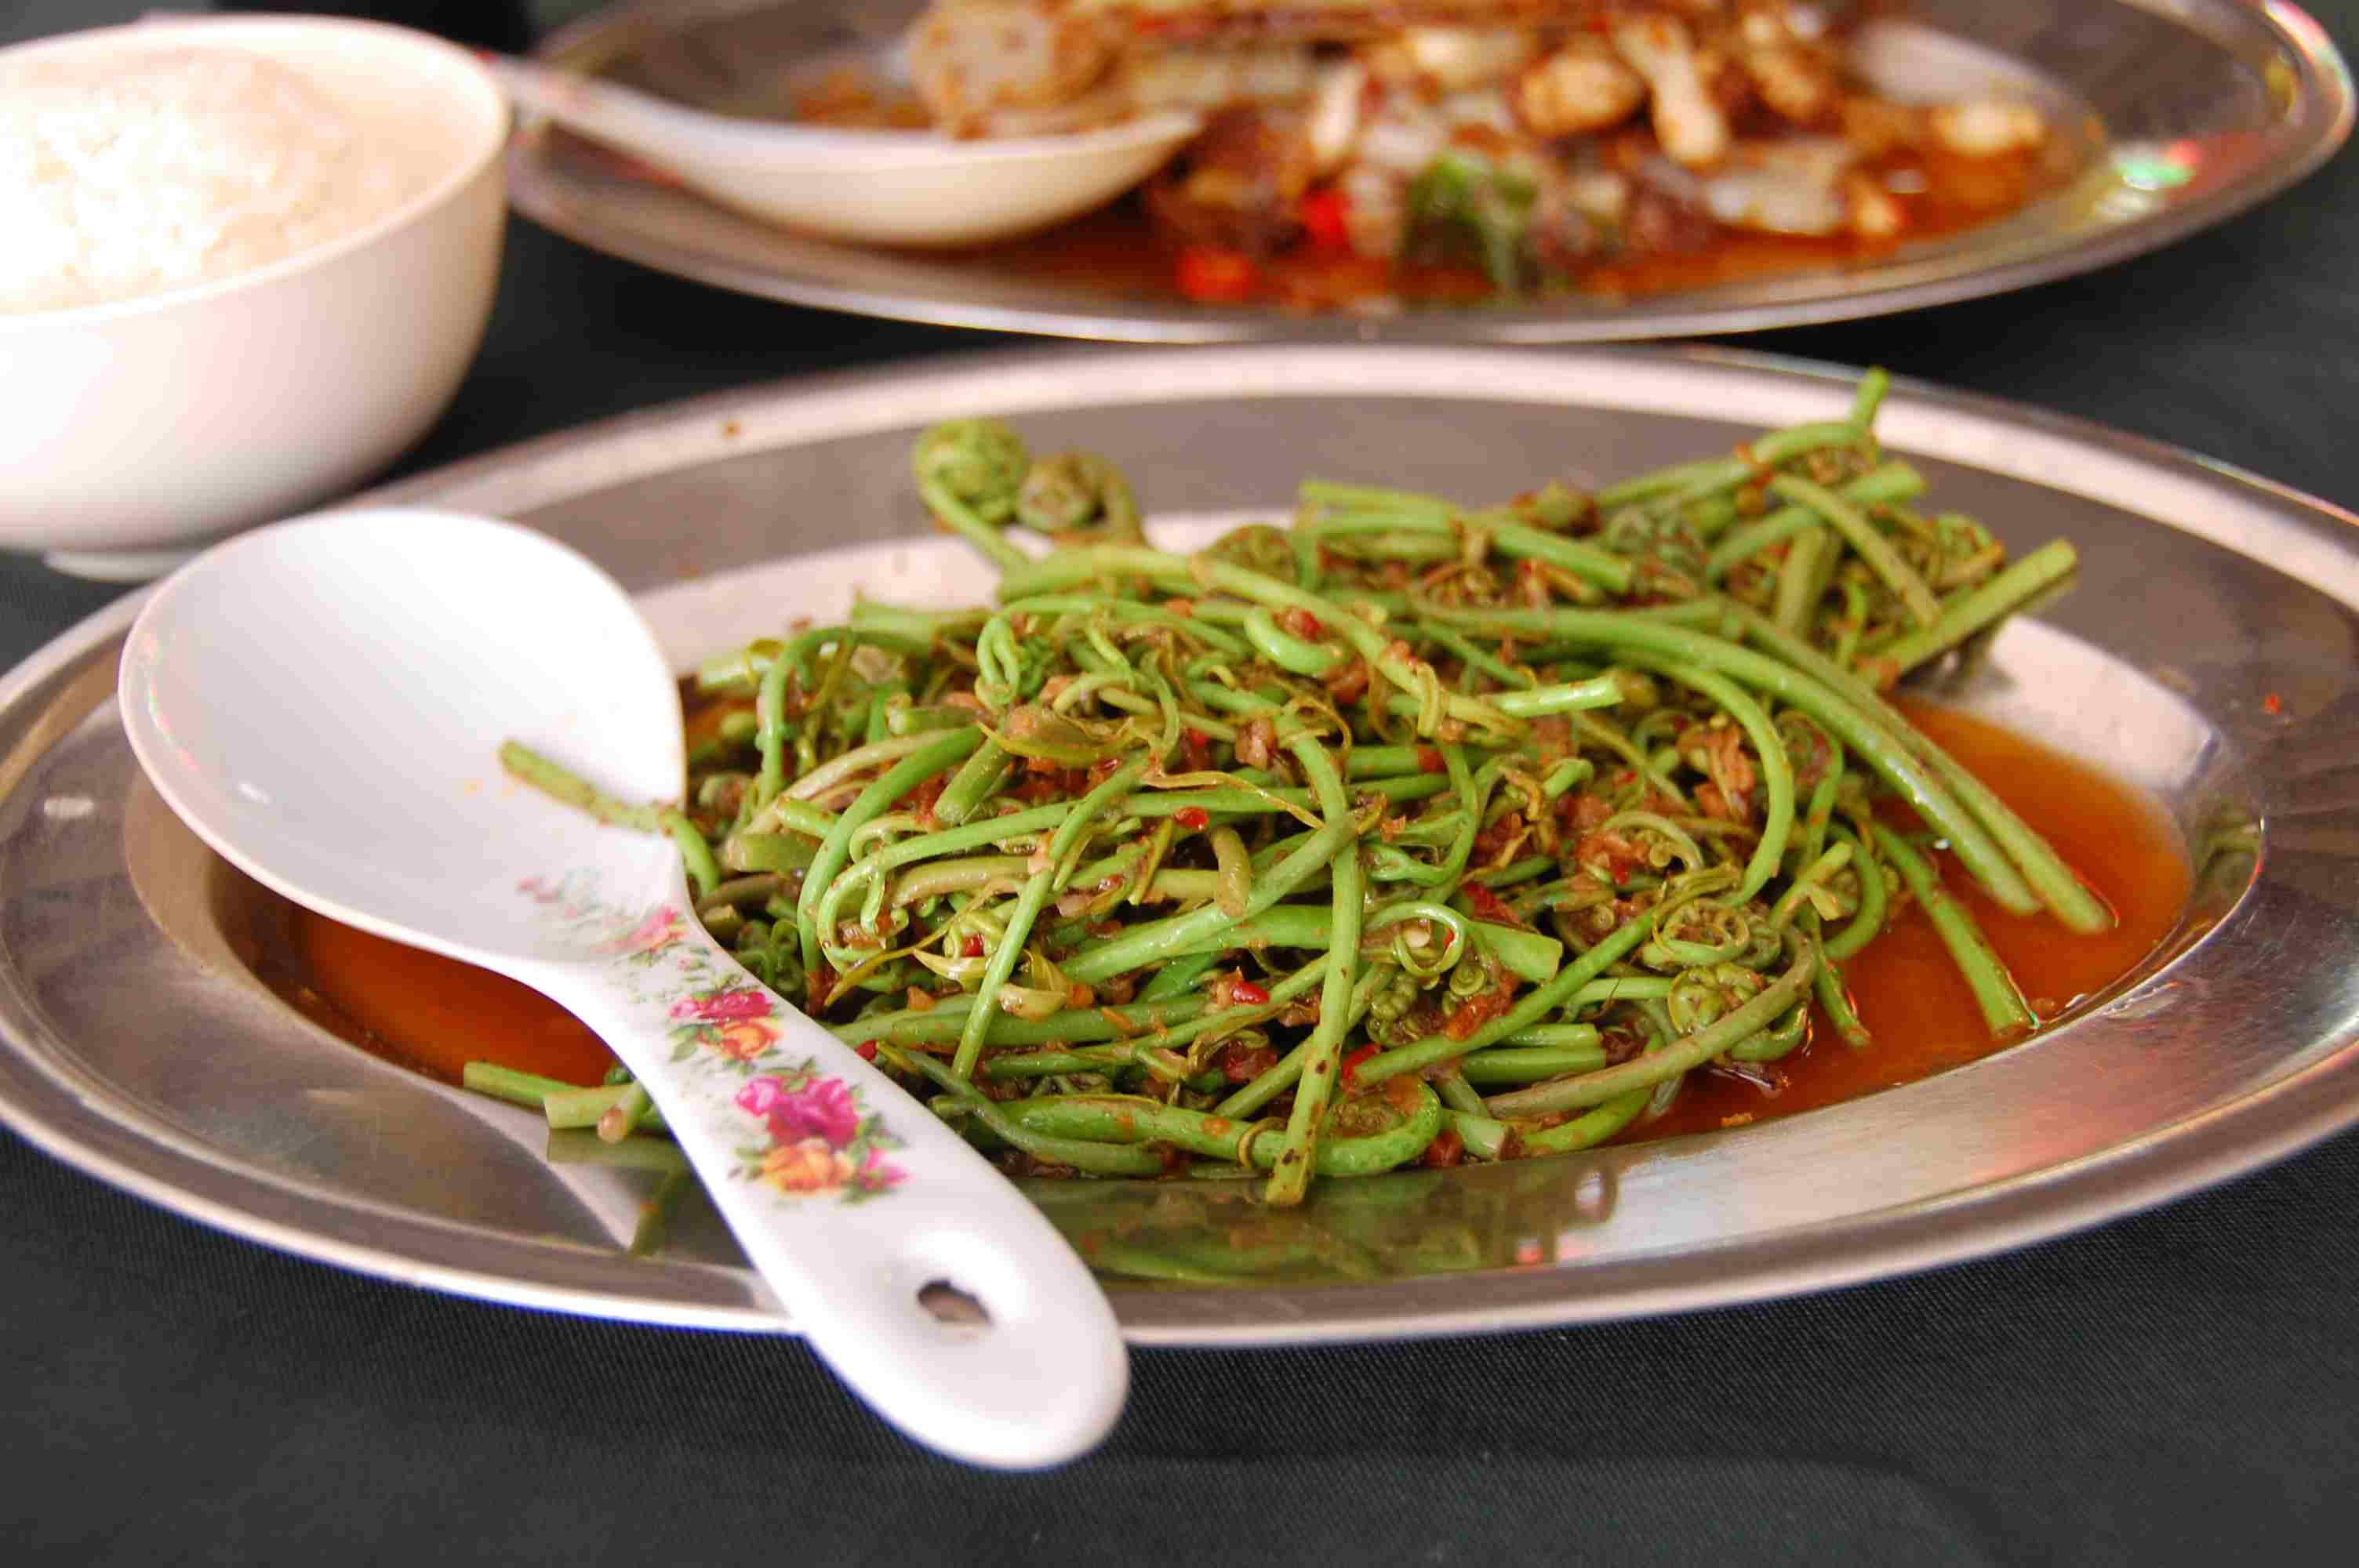 midin Sarawak food